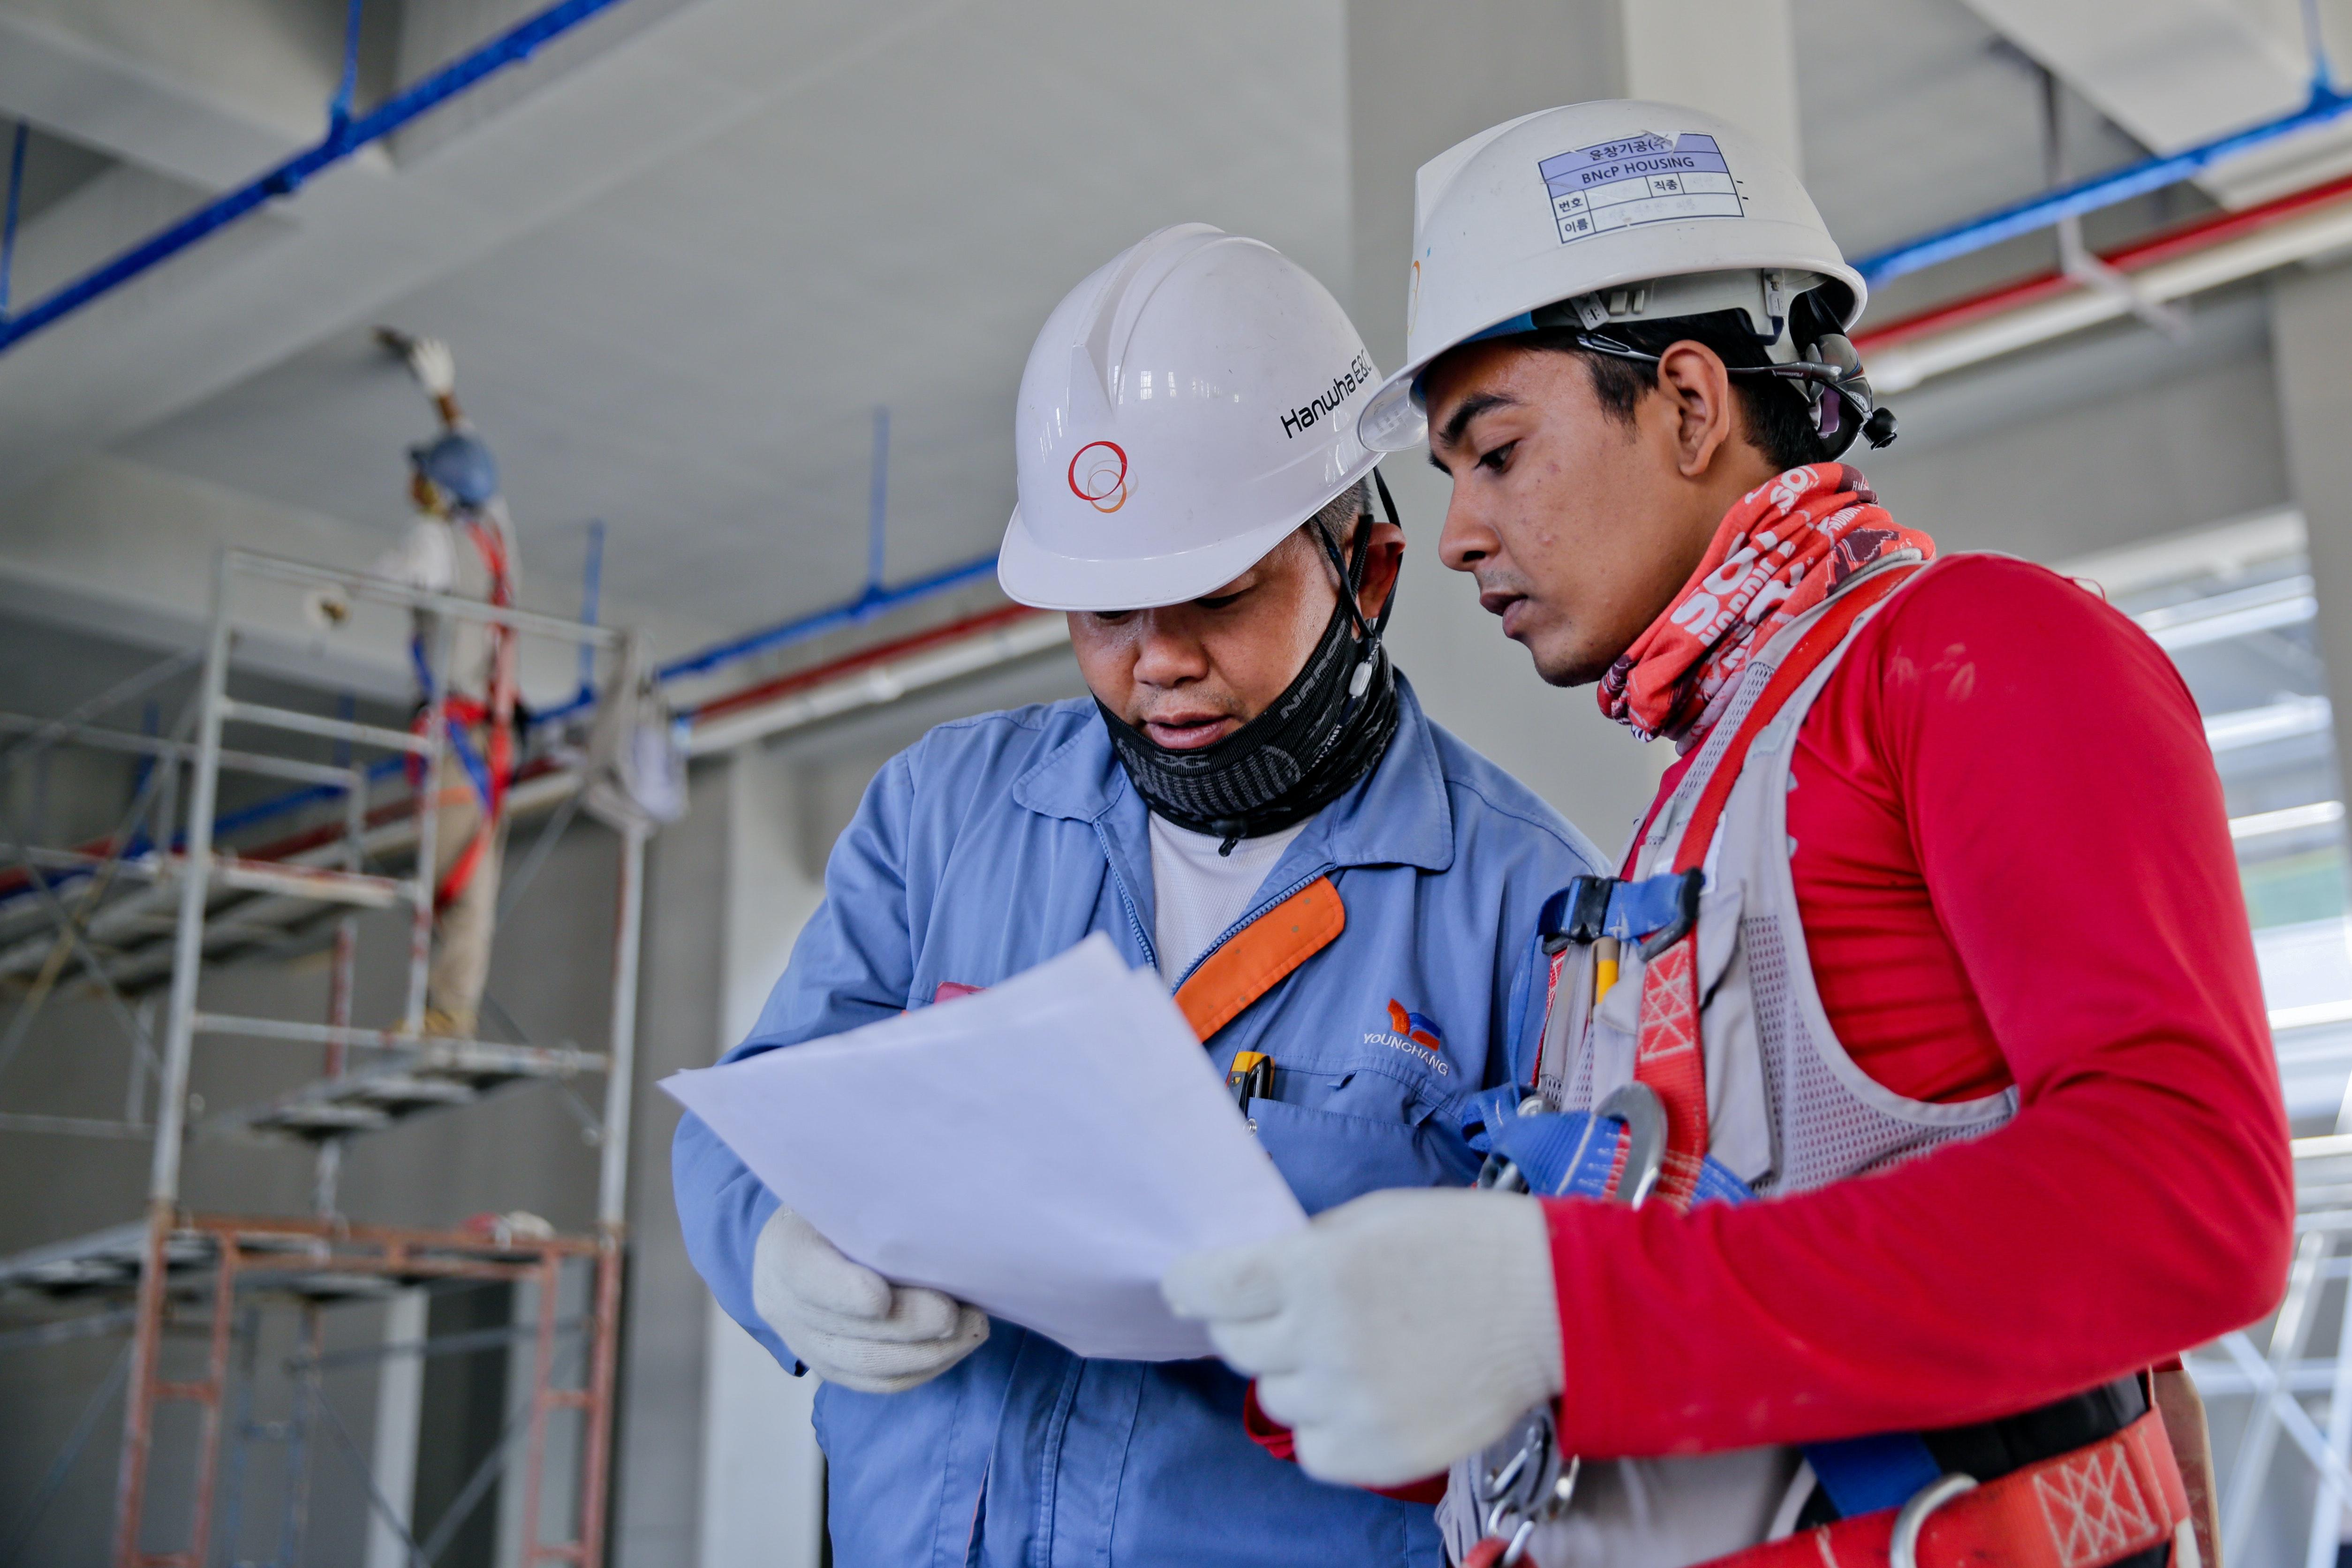 Engineer mentoring apprentice